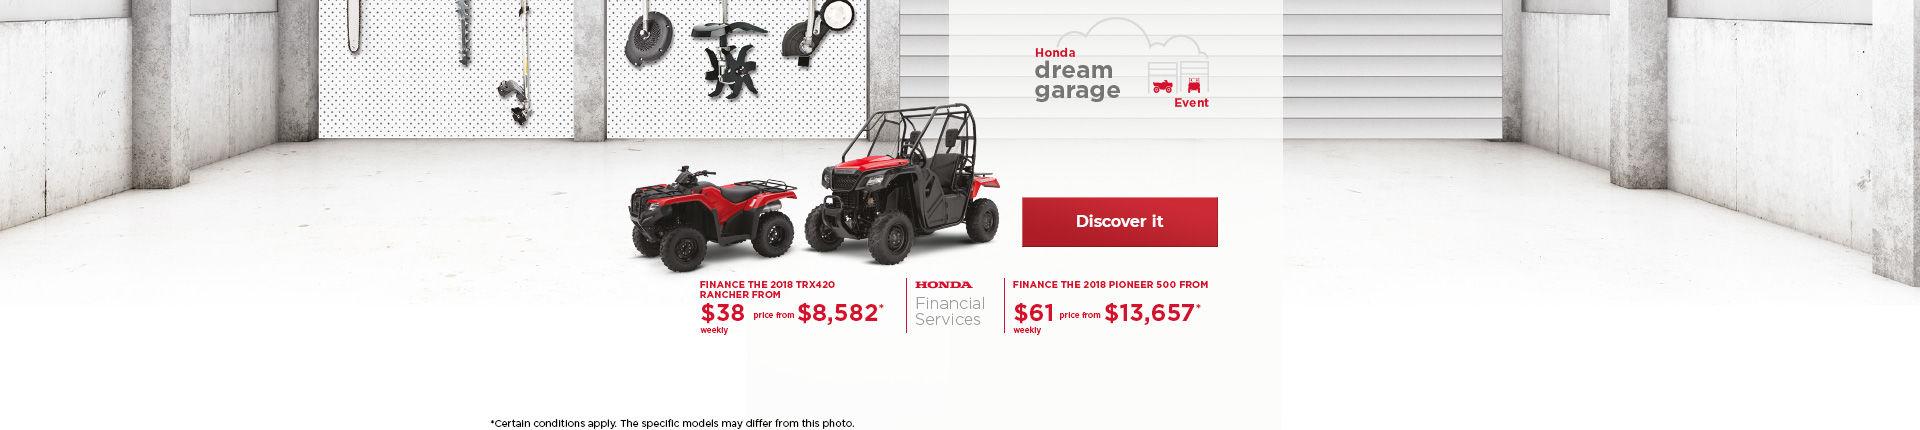 Honda Dream Garage on ATVs